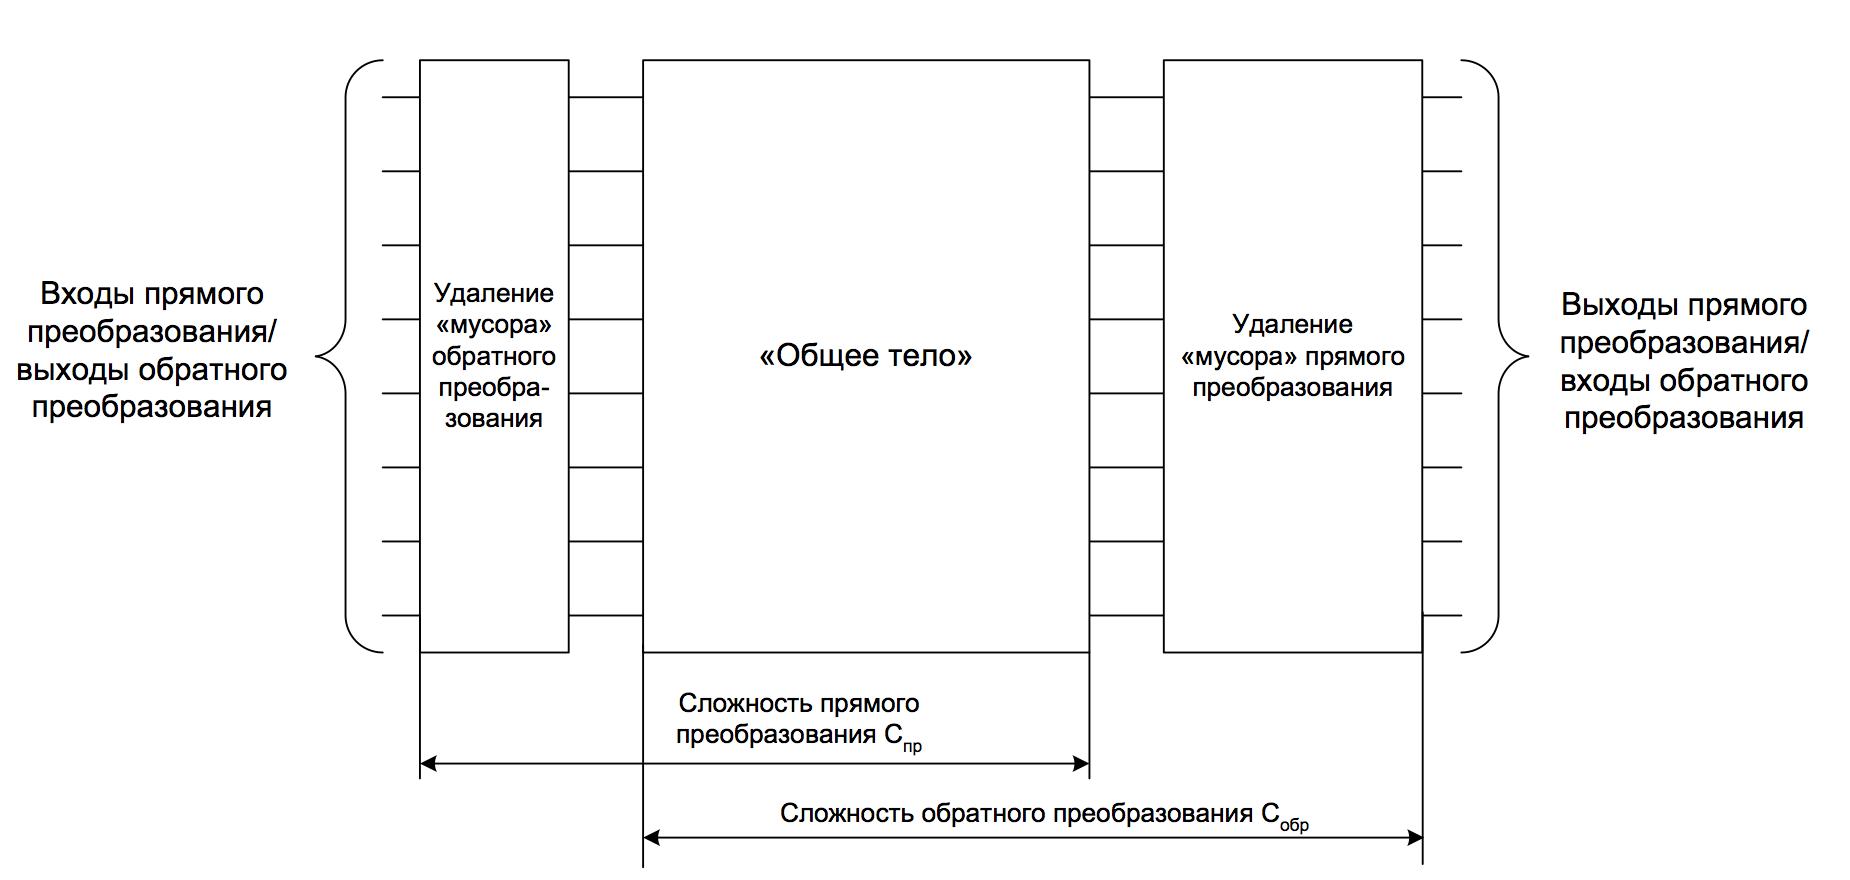 gukov_ris8